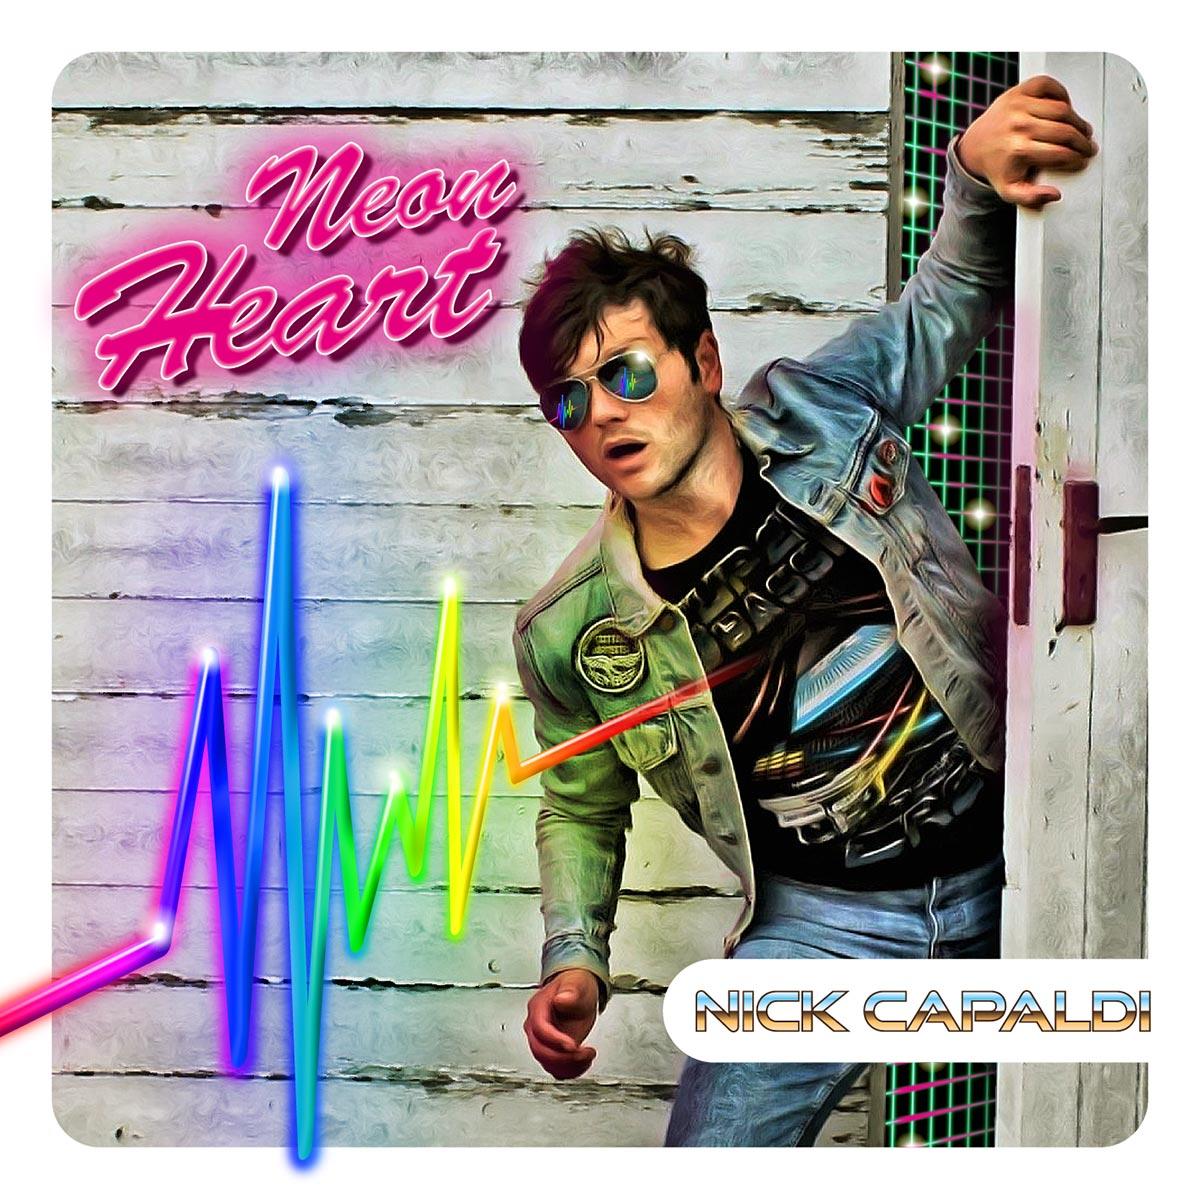 Nick Capaldi Musician - Neon Heart CD cover